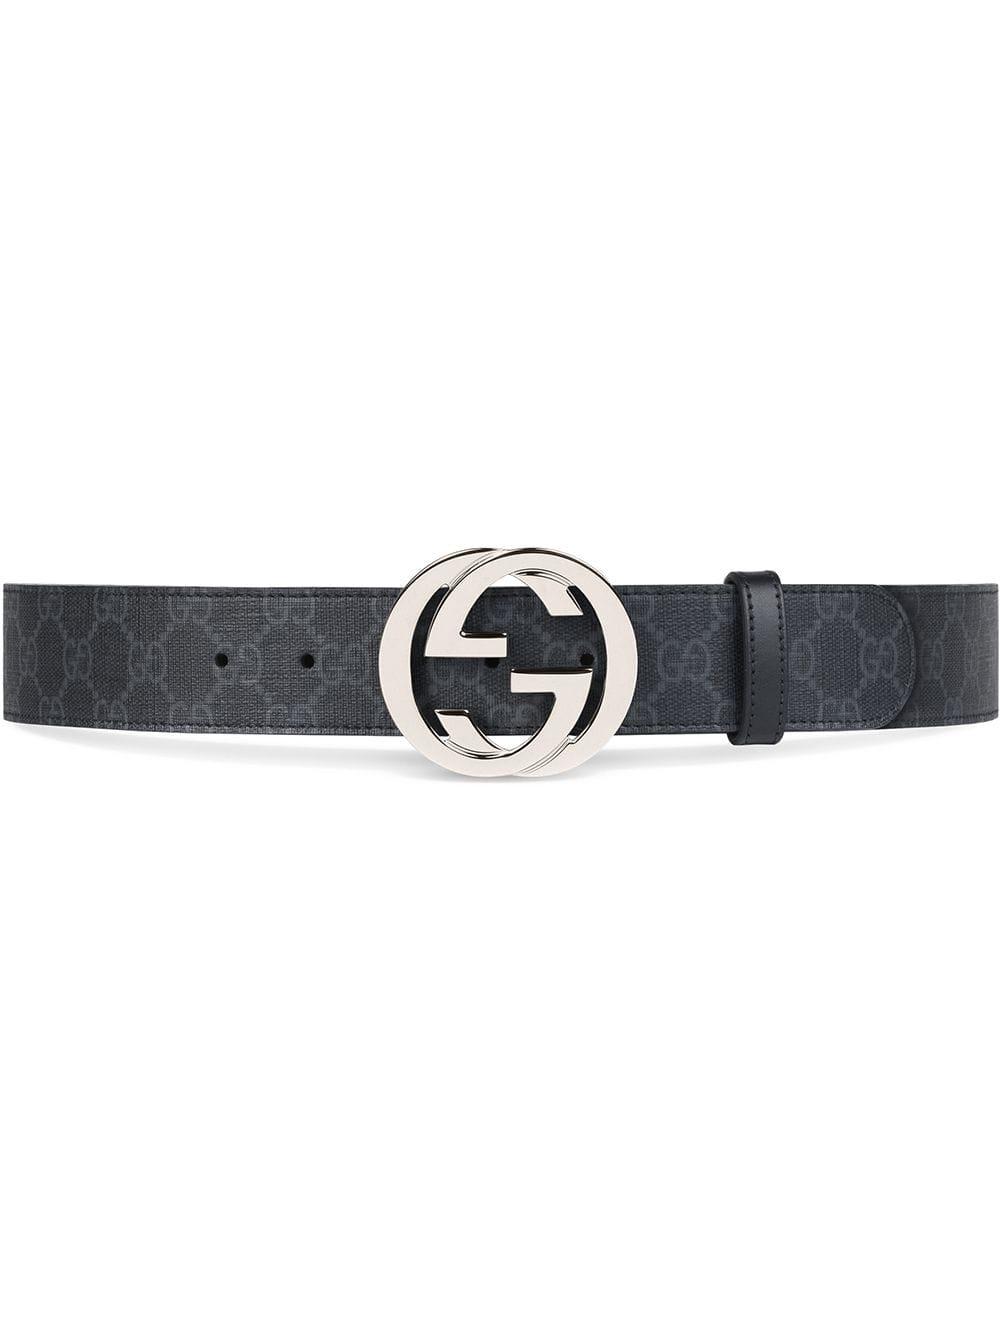 Gg Supreme Belt